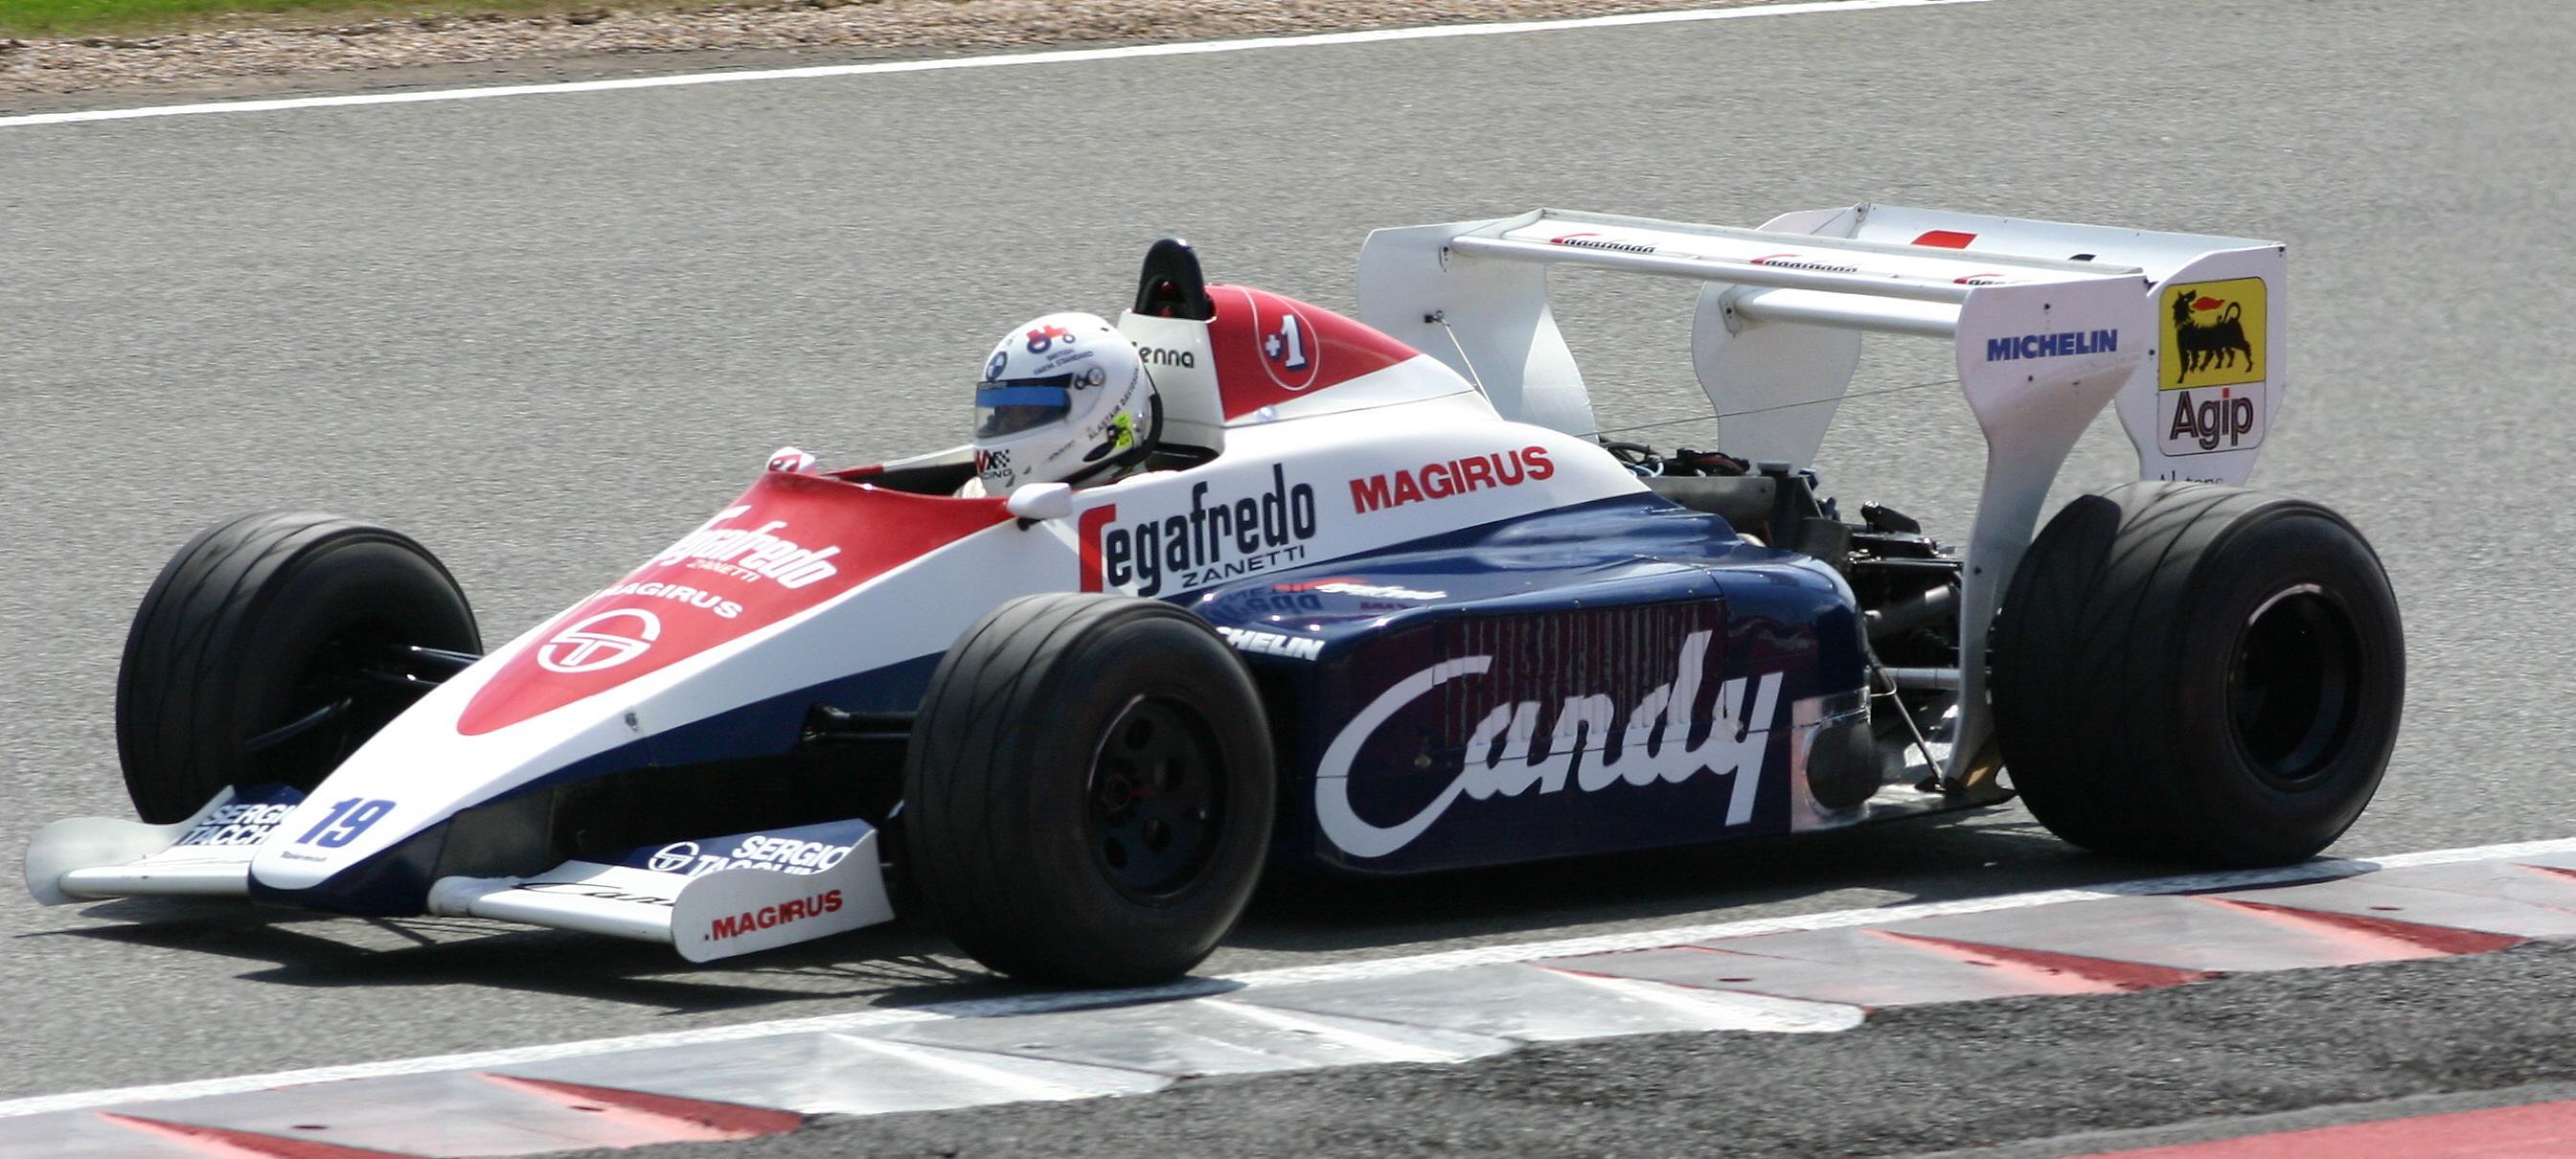 Senna 1984 Toleman TG184